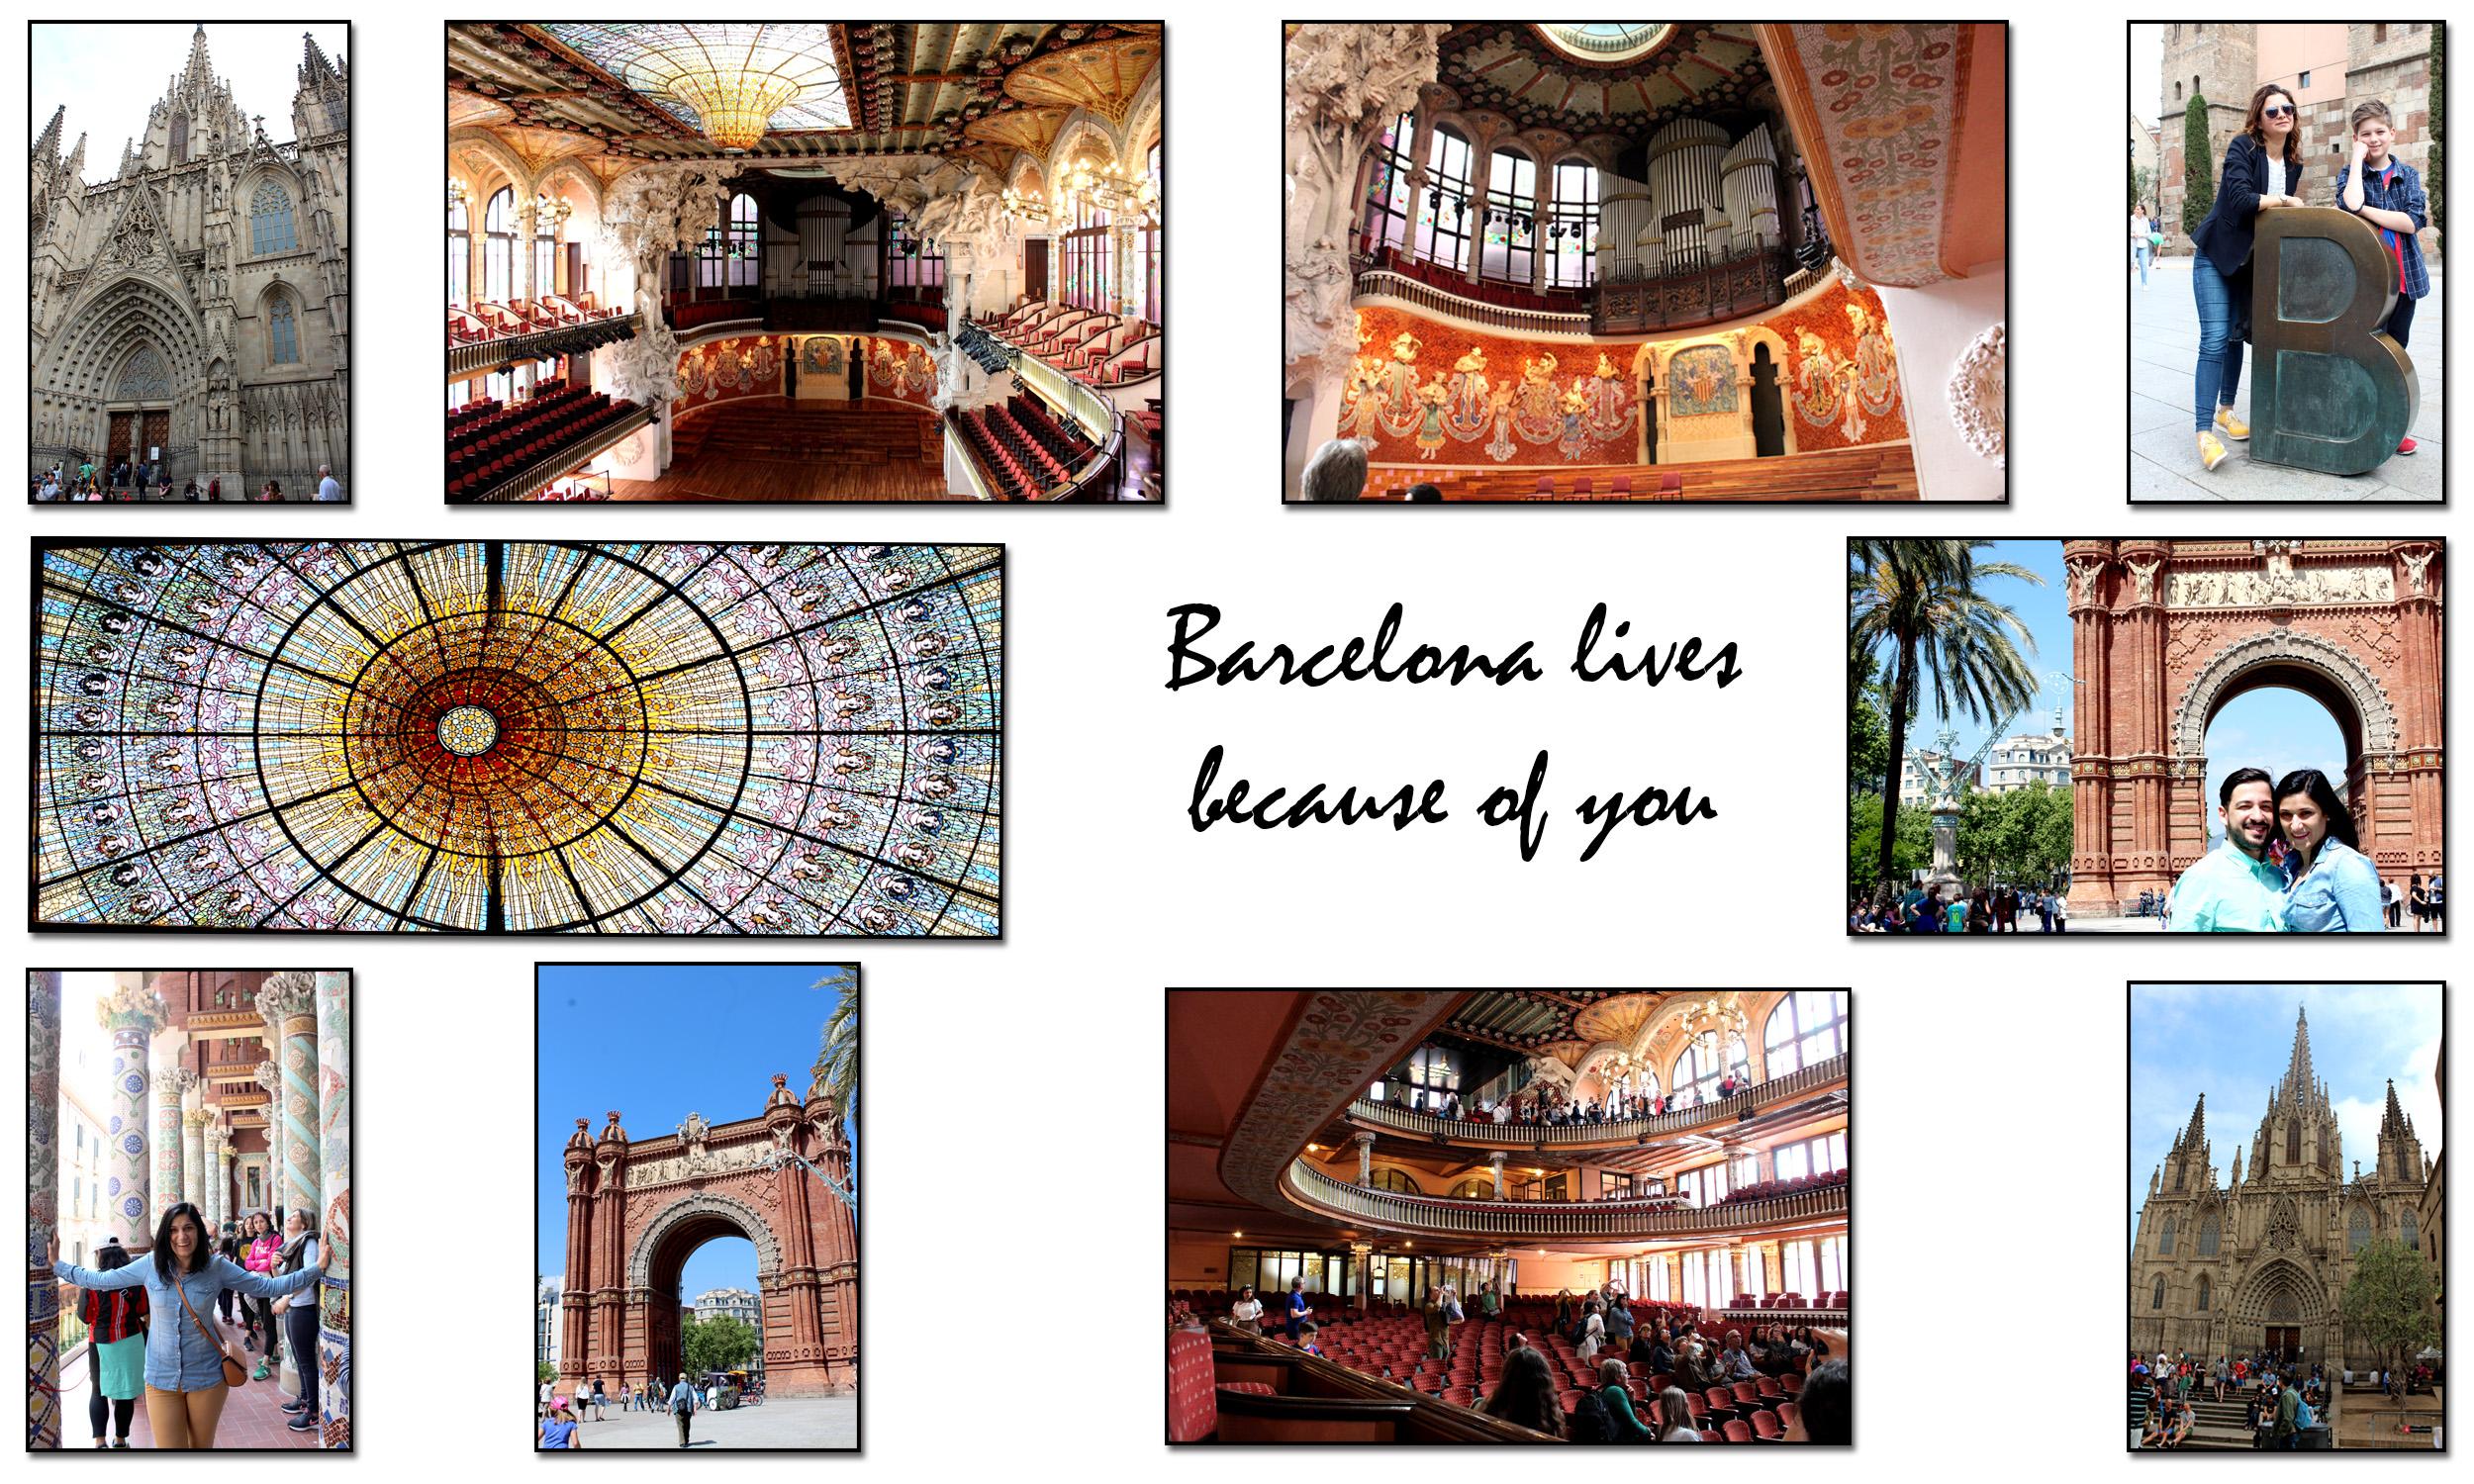 Palau de musica catalana, arc, catedrala BCN